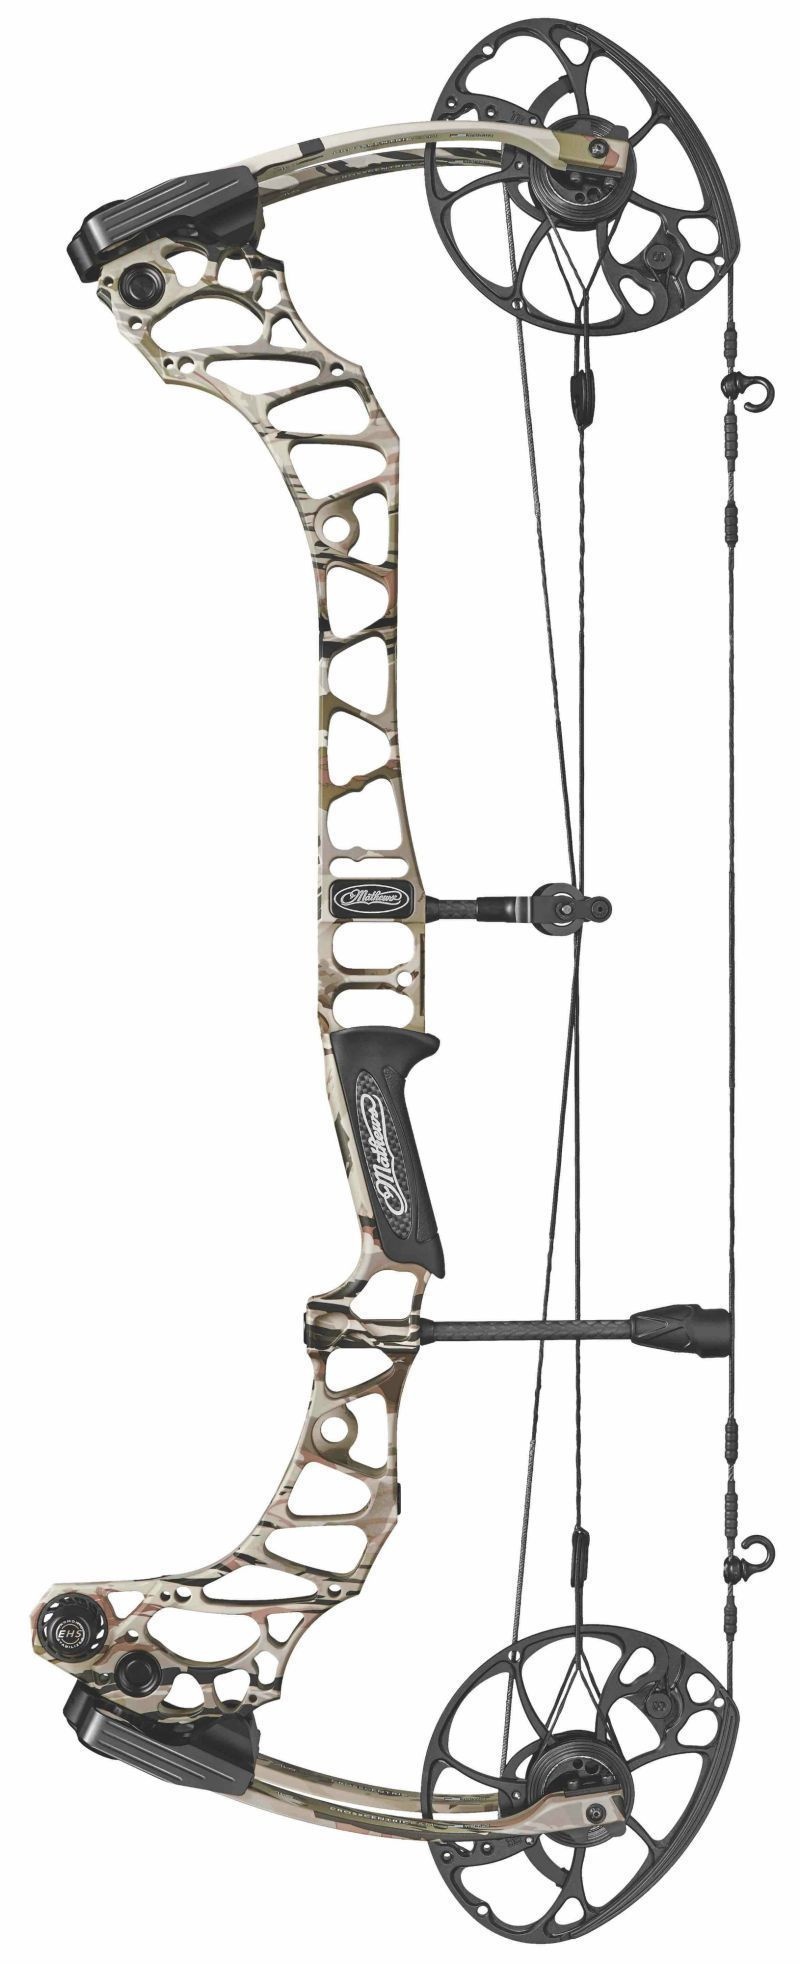 Bow Review: 2019 Mathews Vertix | Archery Business